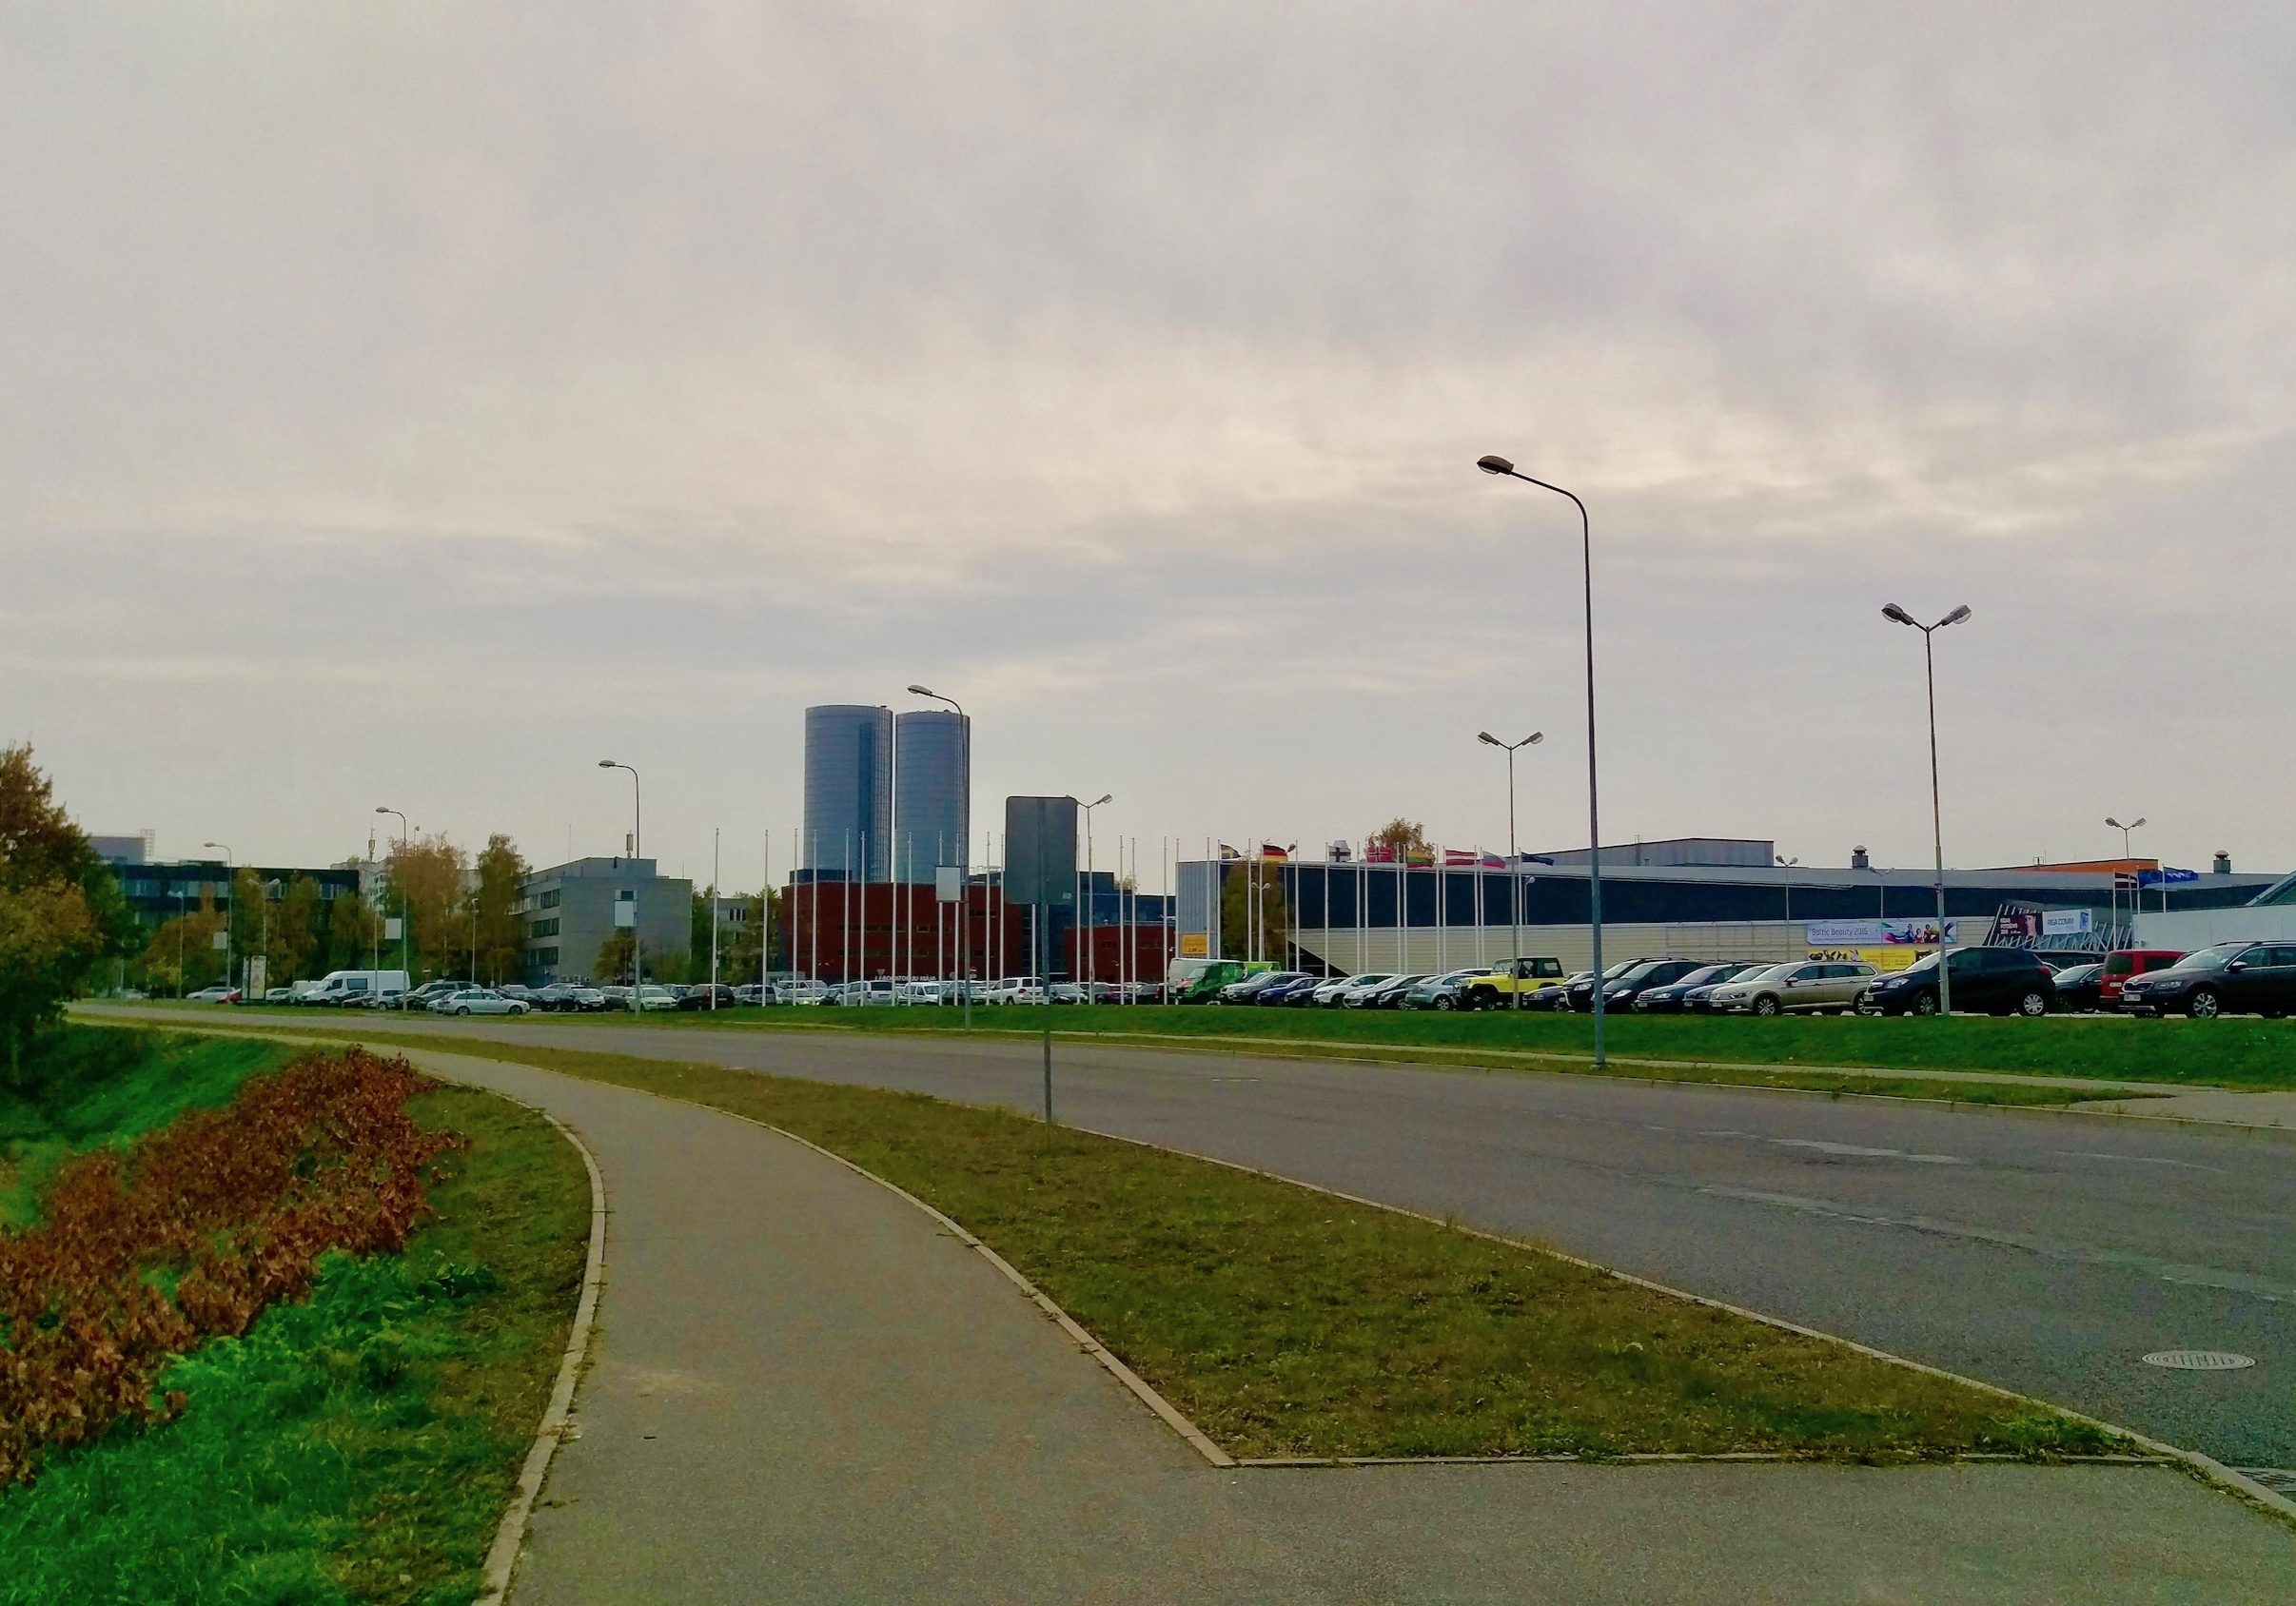 International Exhibition Center in Kipsala